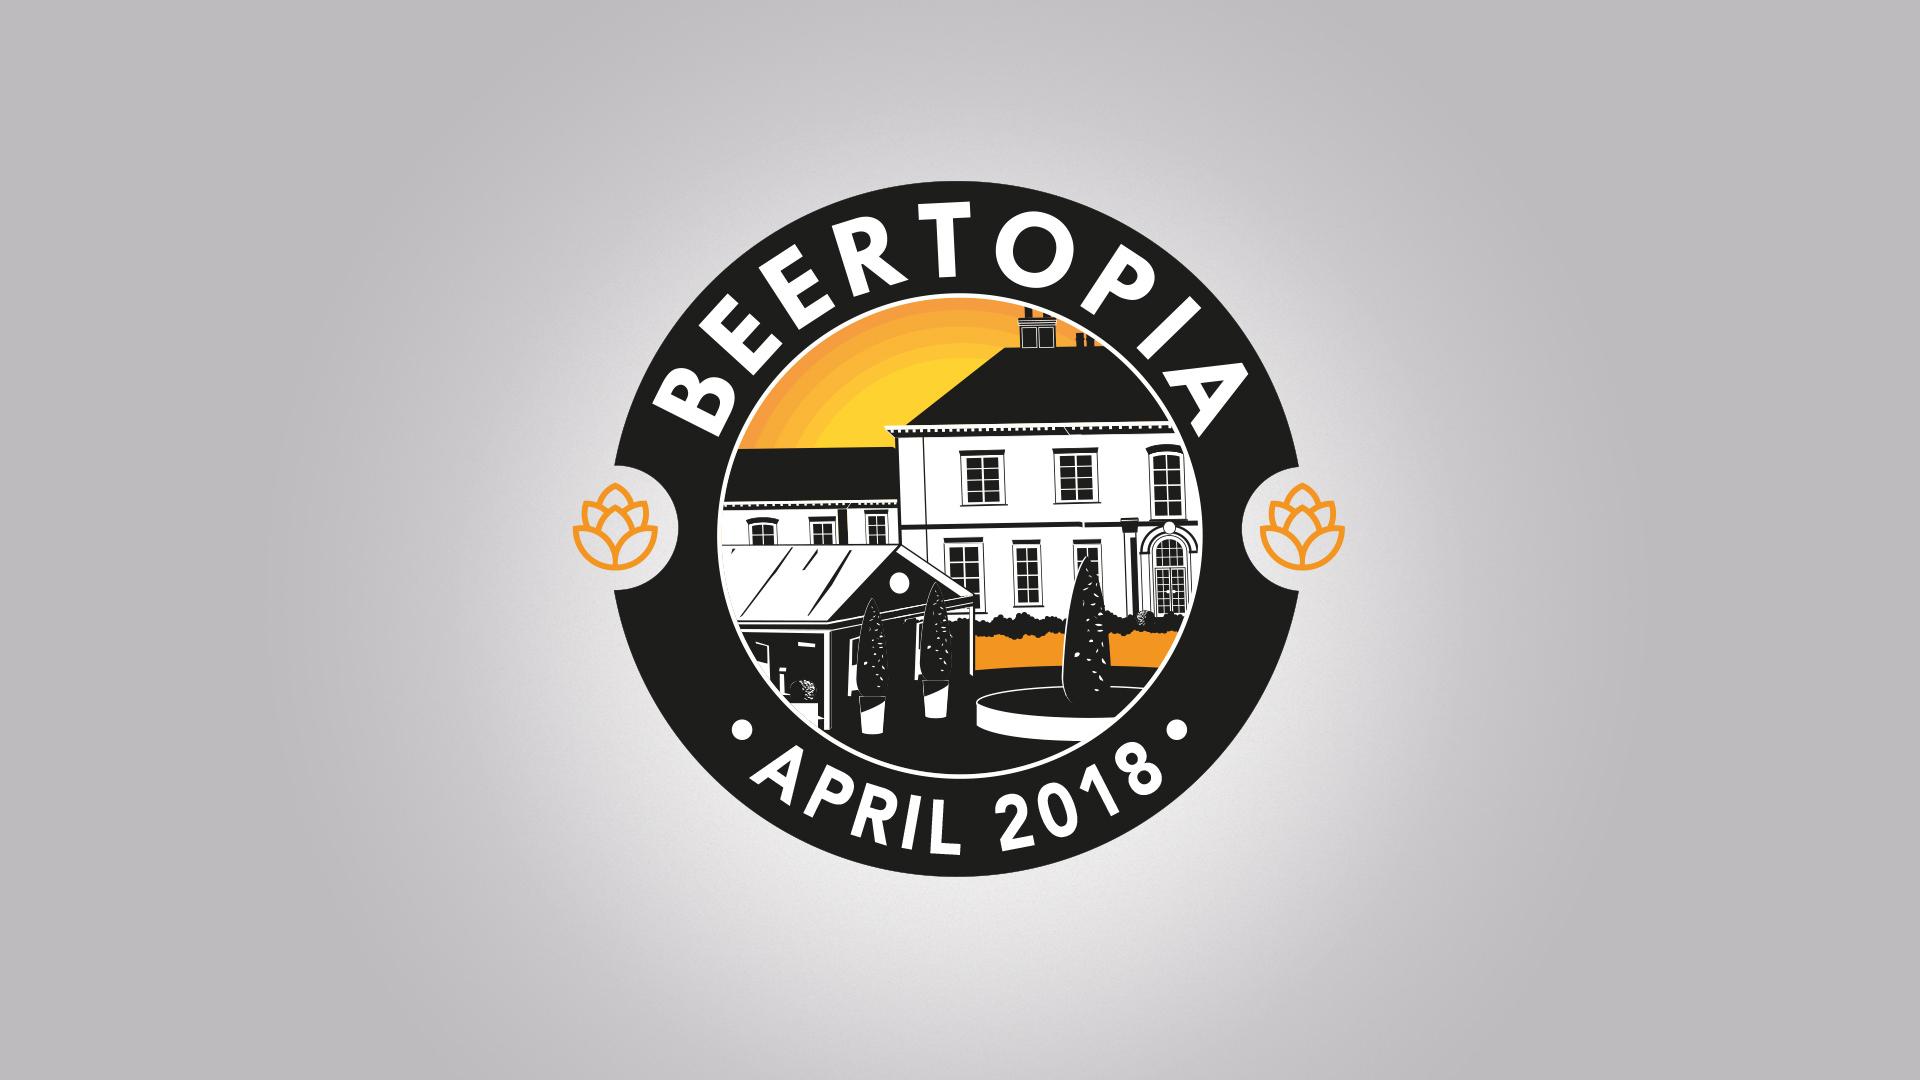 Beertopia at Milsoms Kesgrave Hall